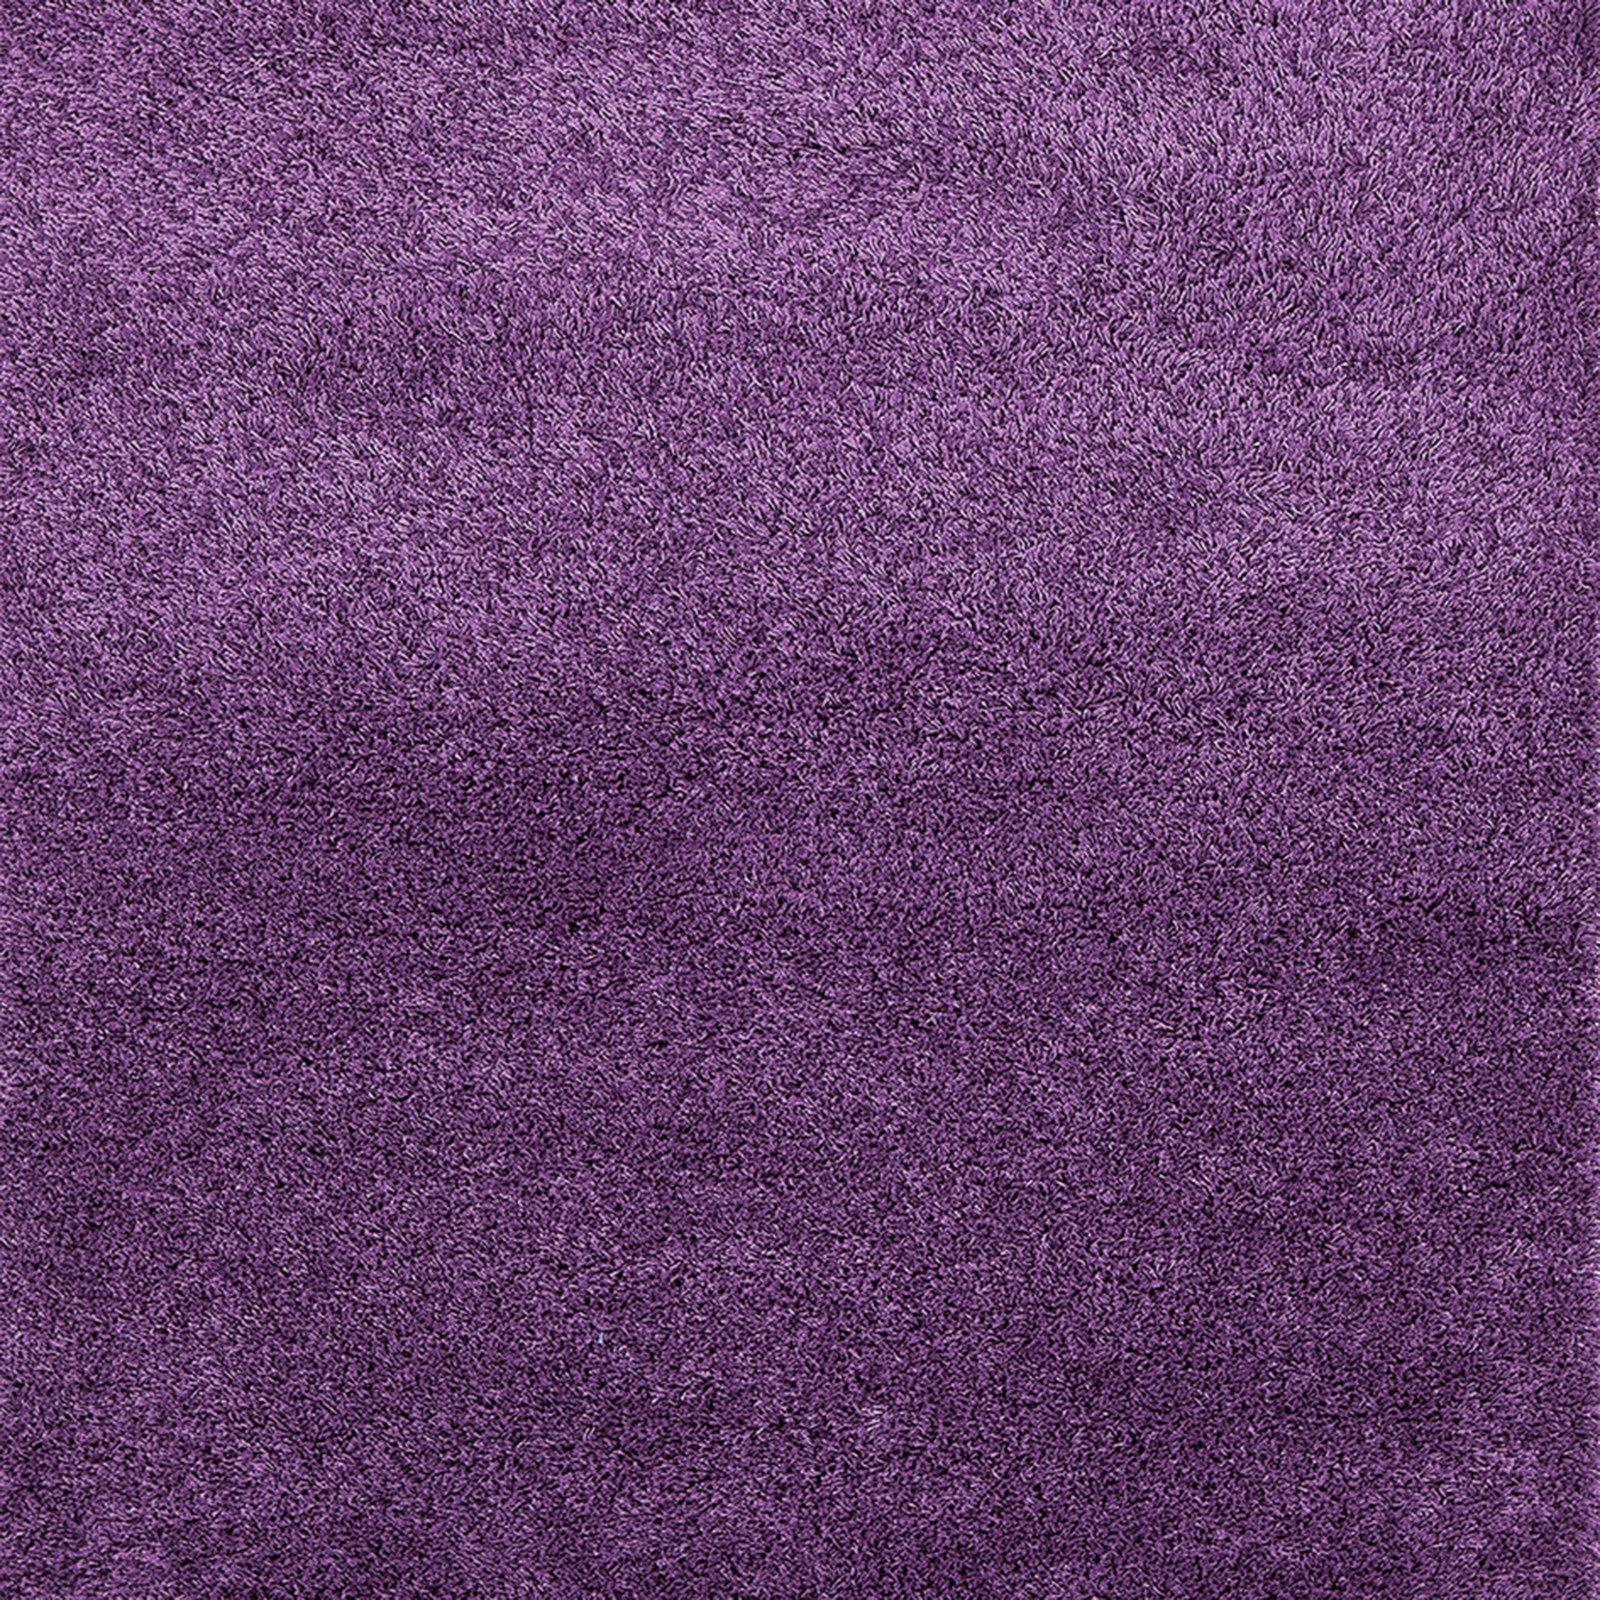 teppich shaggy plus lila 50x100 cm einfarbige teppiche teppiche l ufer deko. Black Bedroom Furniture Sets. Home Design Ideas